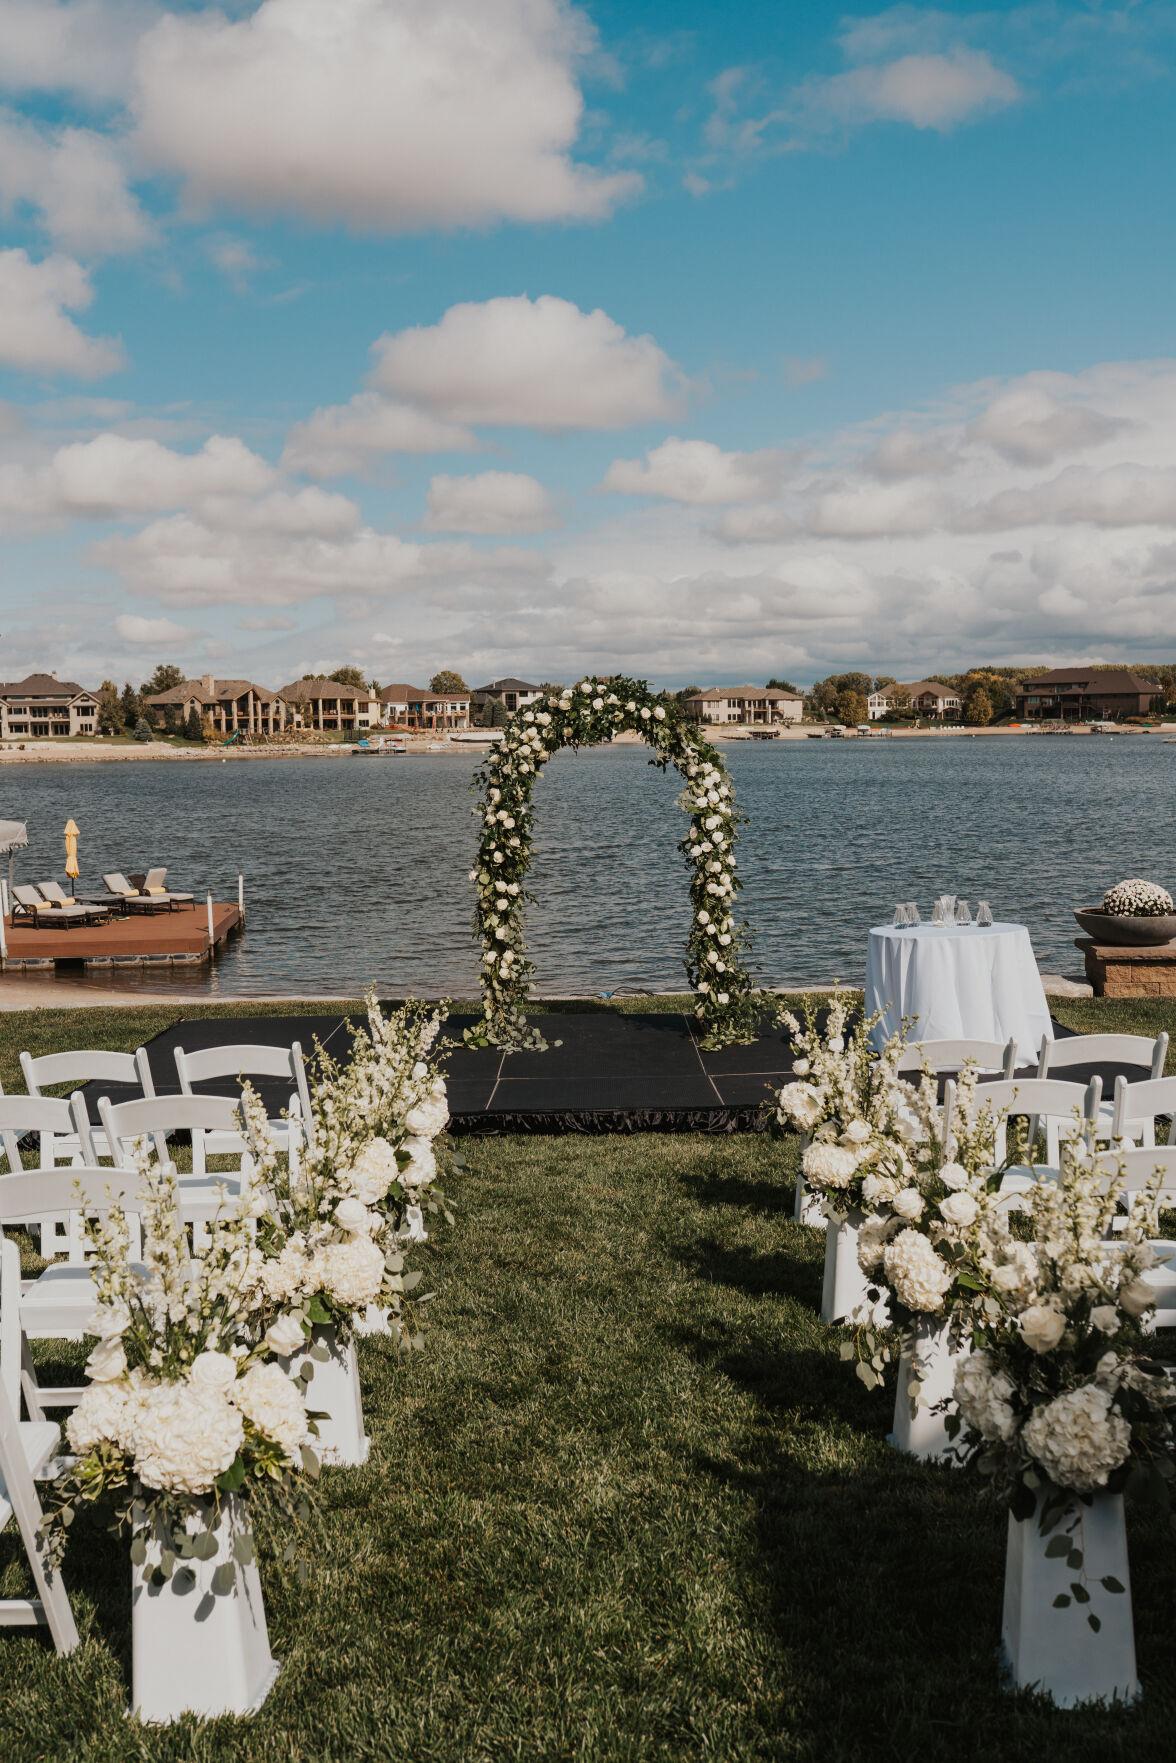 090521-owh-liv-wedding-p2